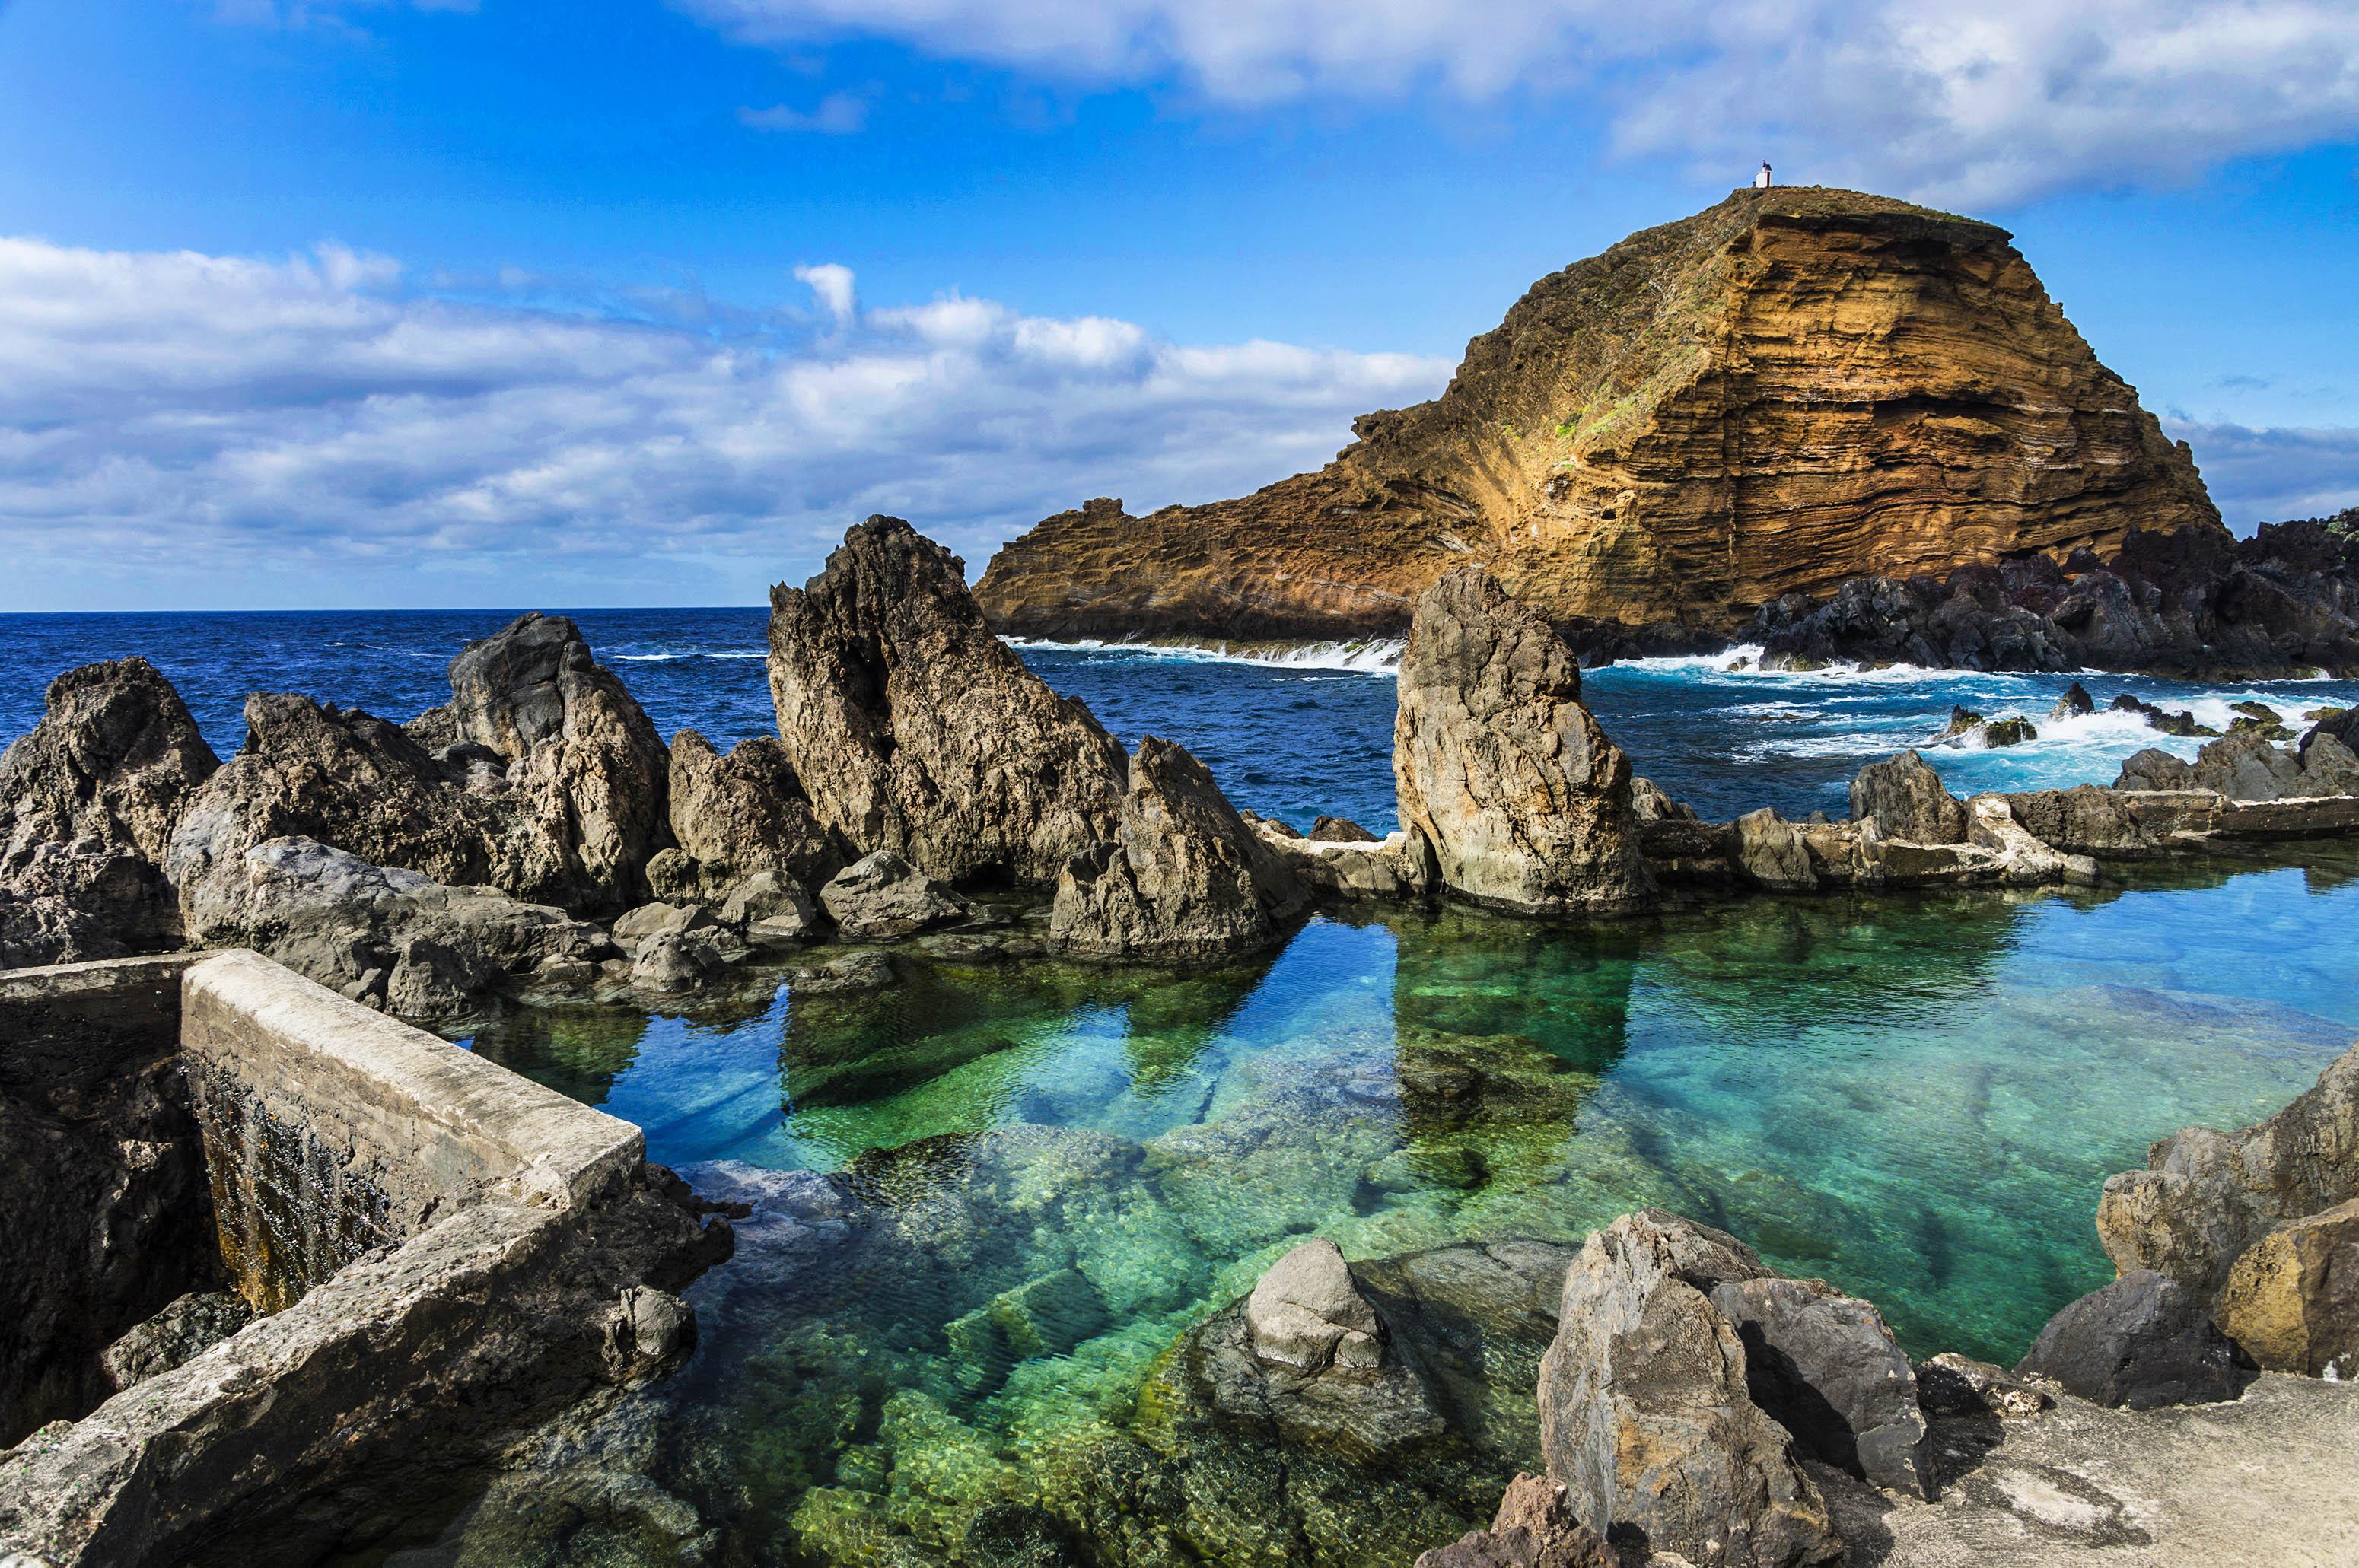 rocky beach off Atlantic Ocean